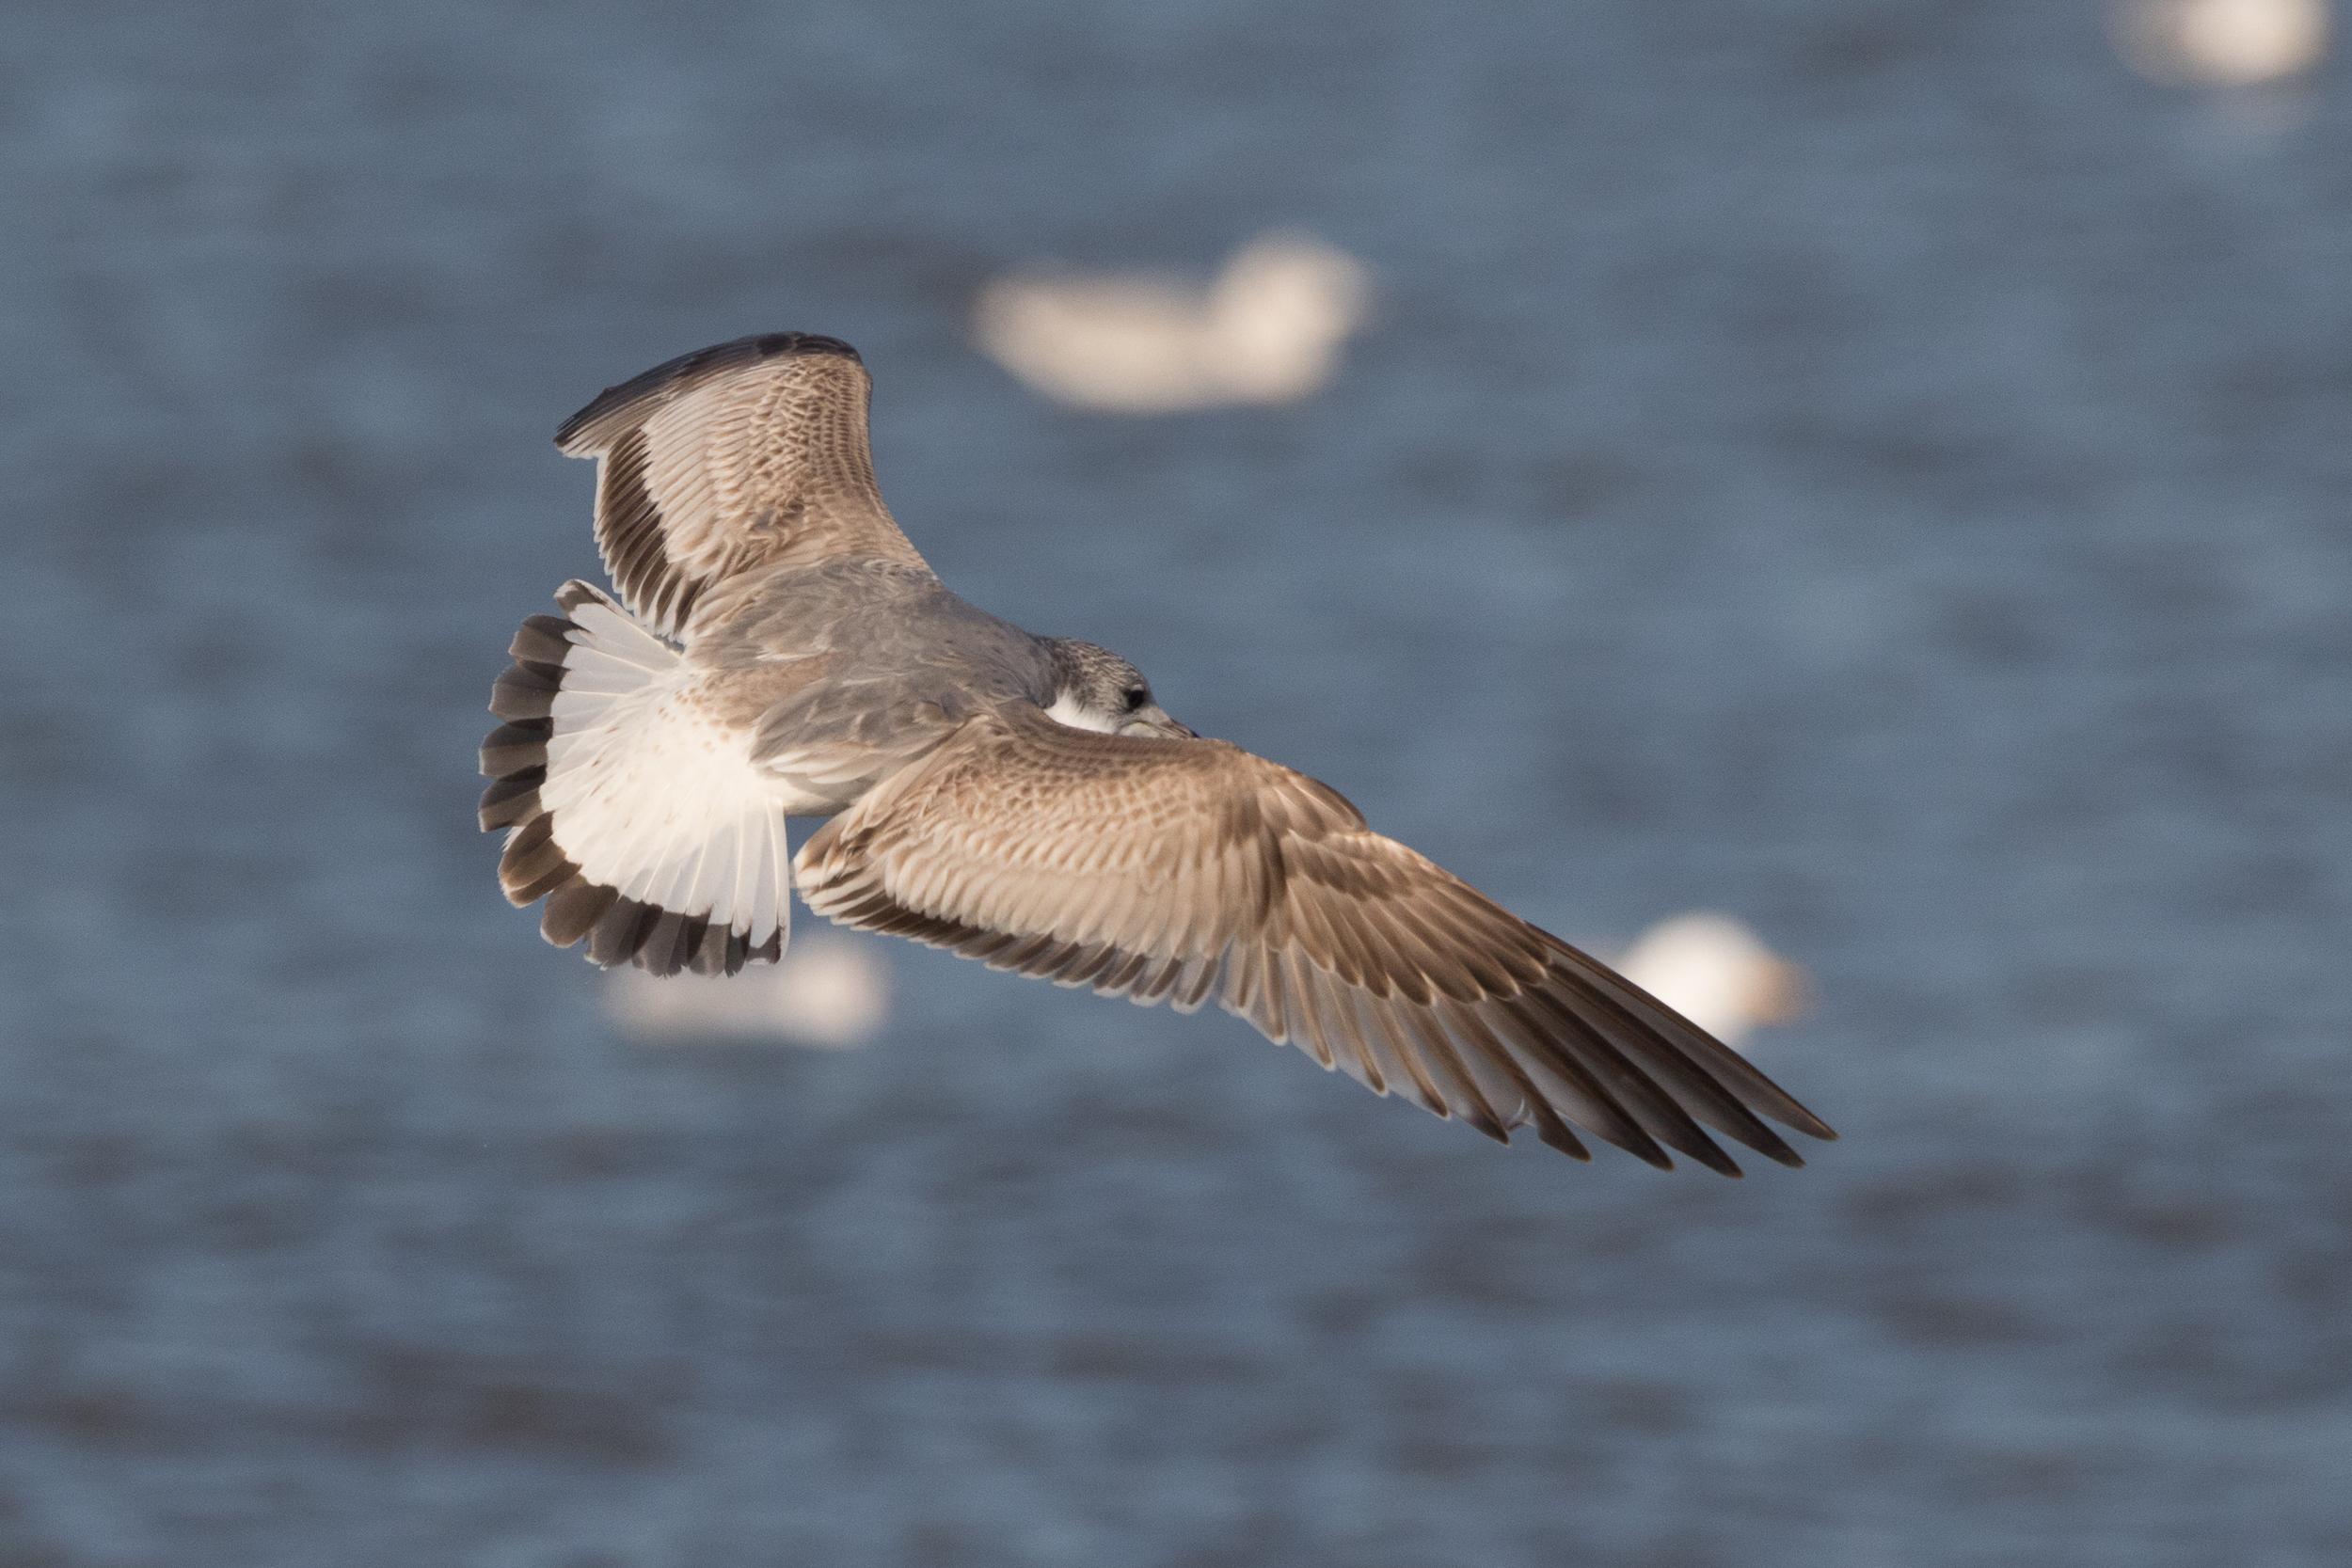 20170121-Common Gull 2CY-13.jpg